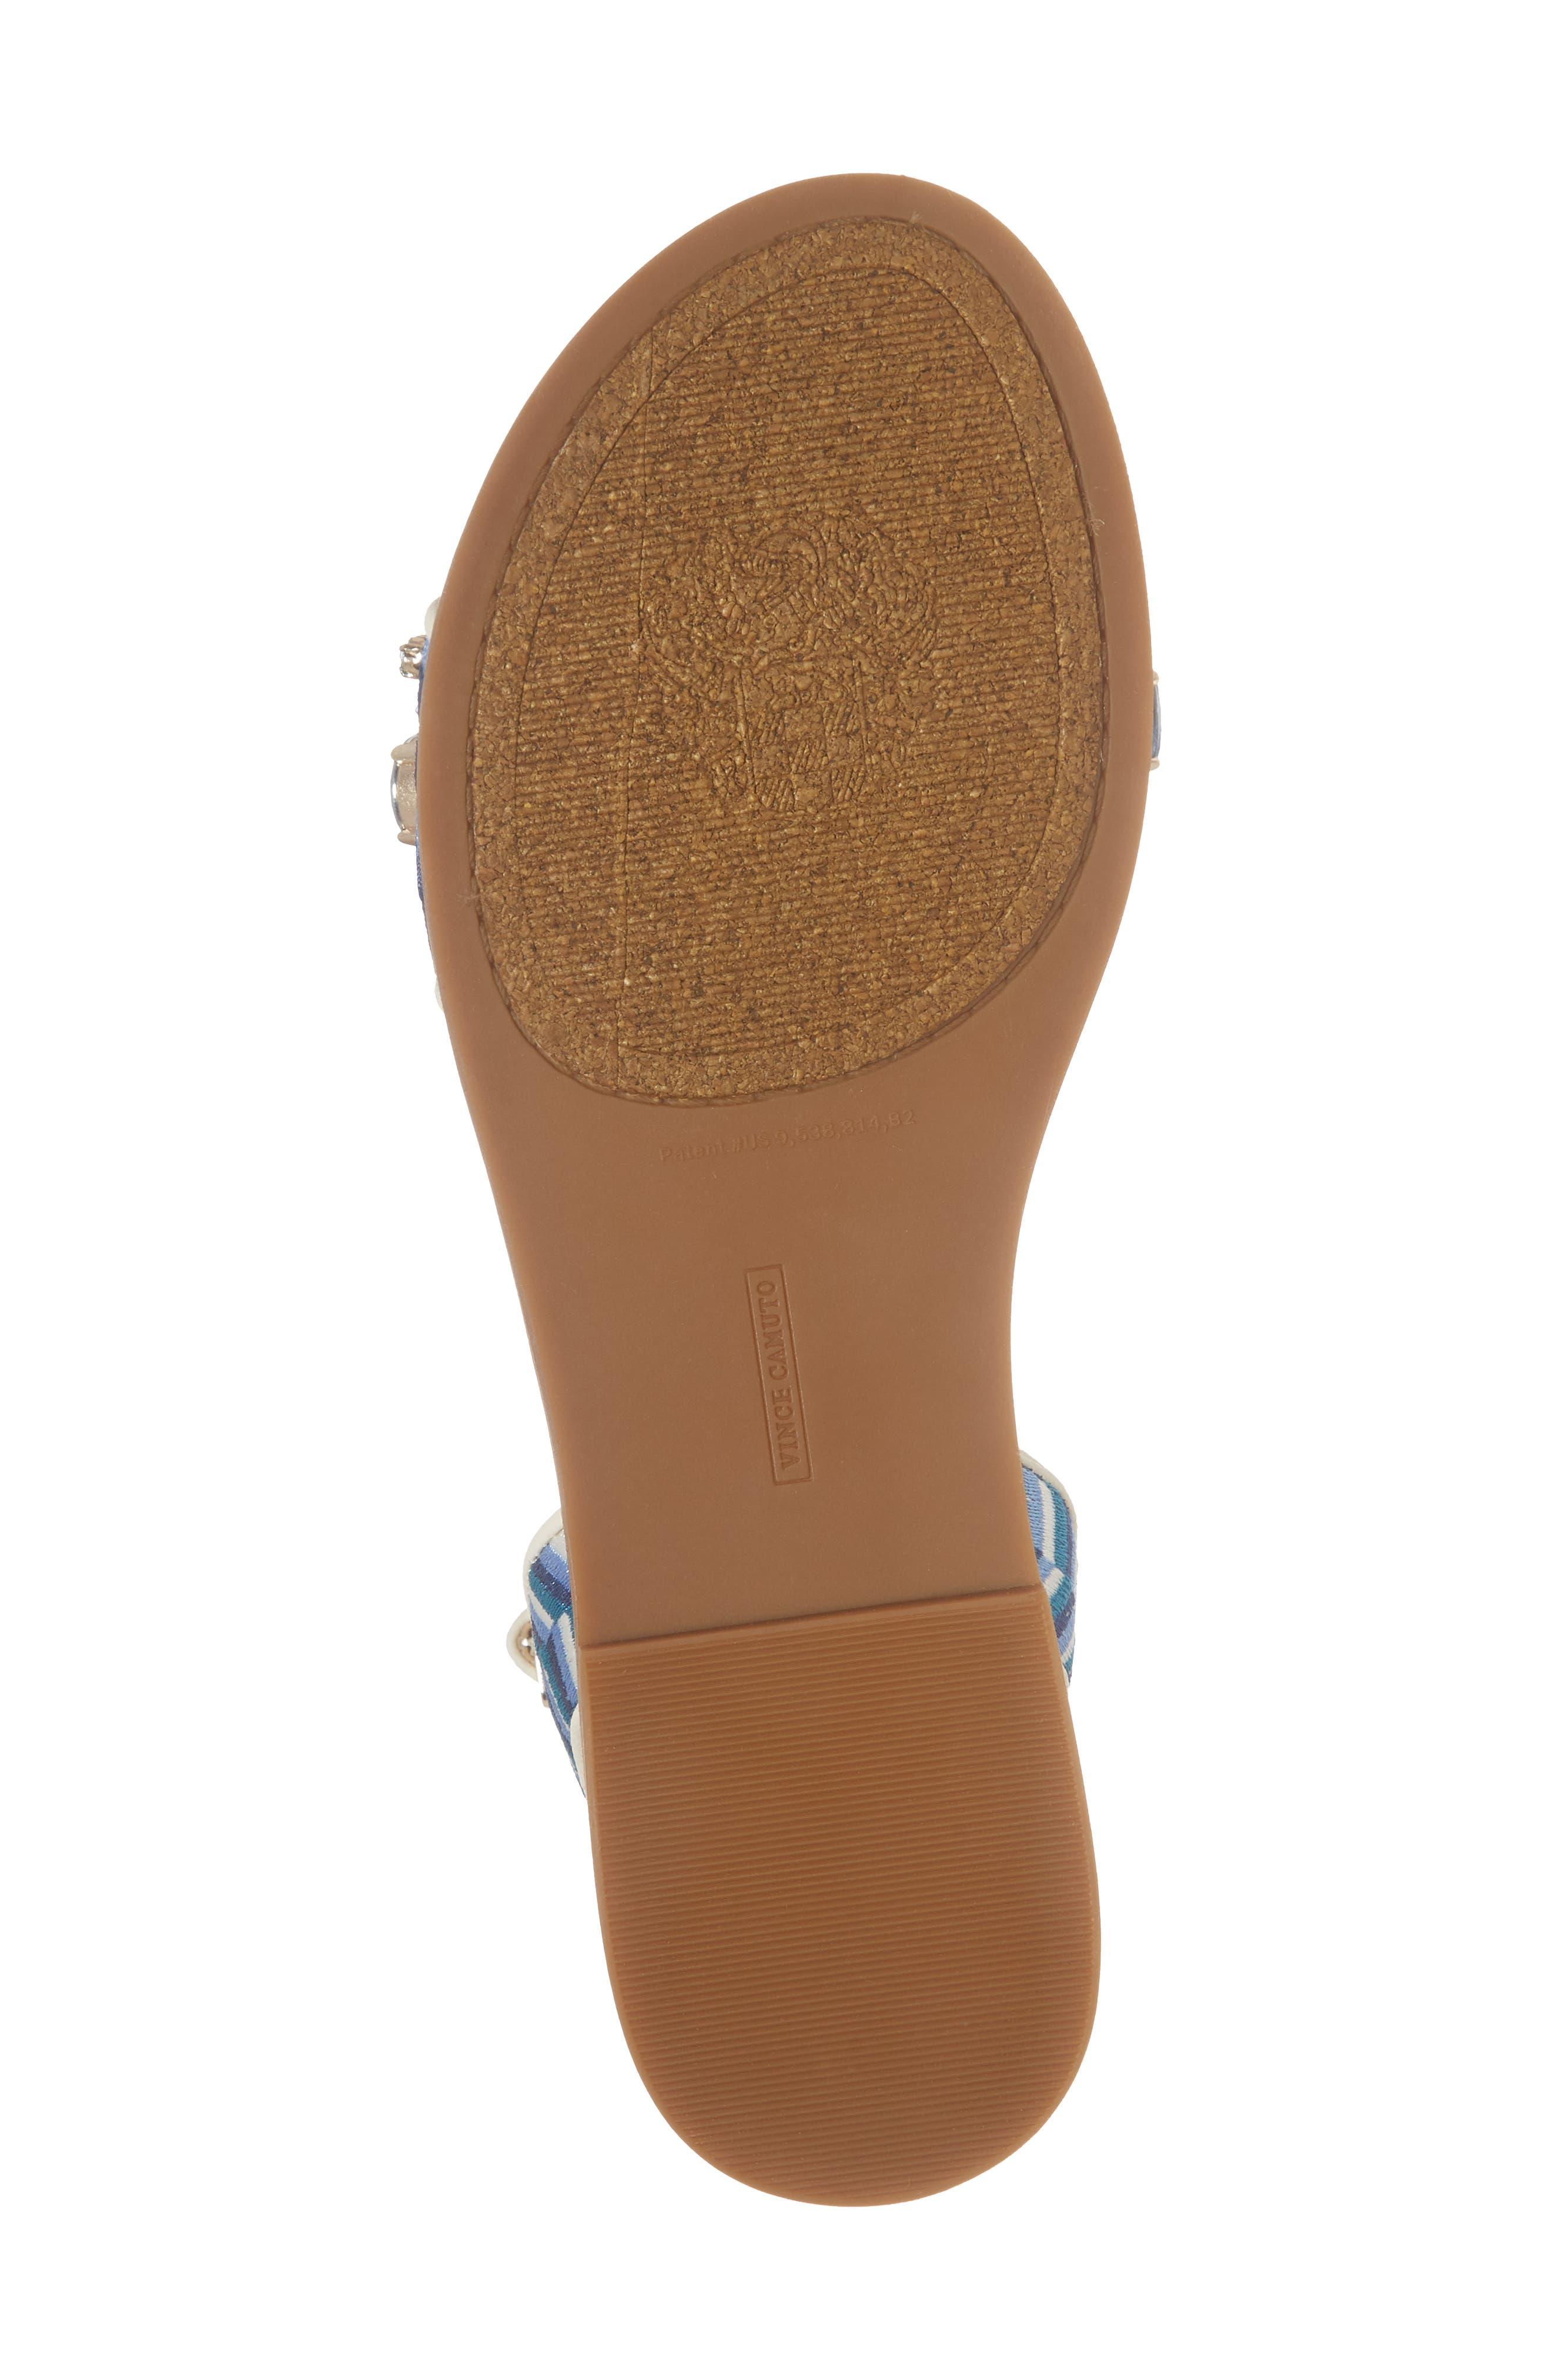 Akitta Sandal,                             Alternate thumbnail 6, color,                             Blue Multi/ Vanilla Fabric